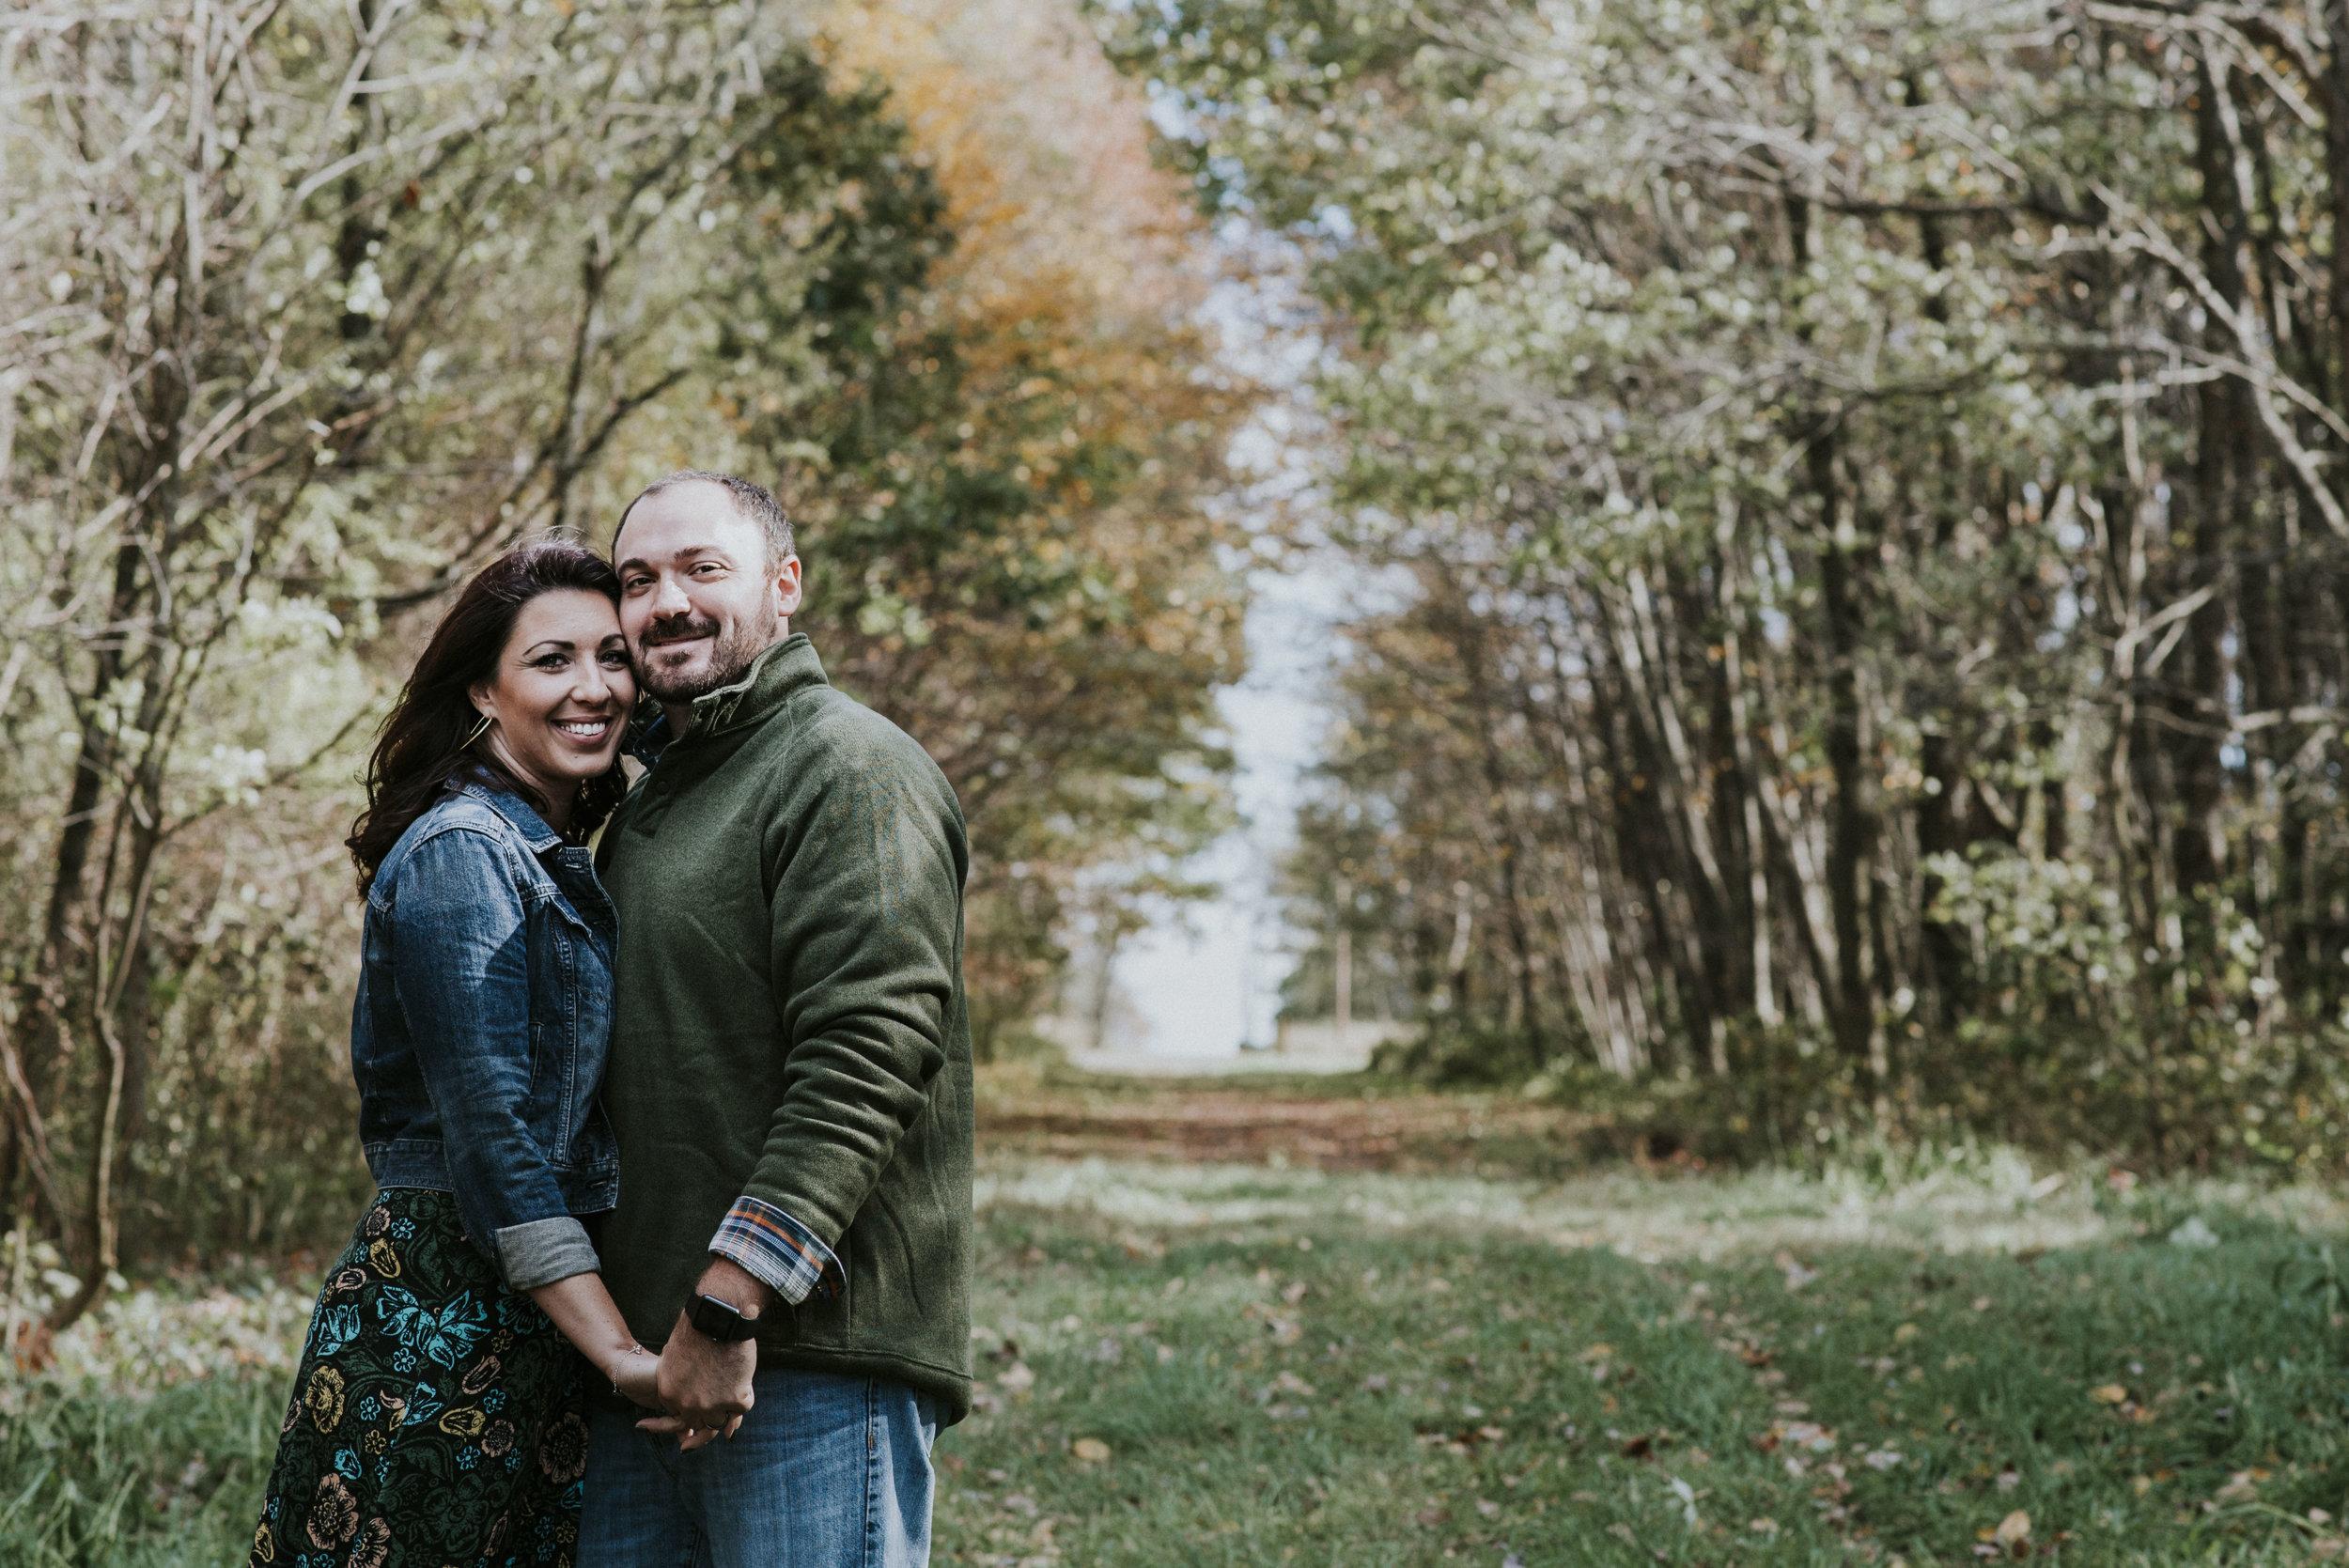 wedding photographer   Sandrachile.com